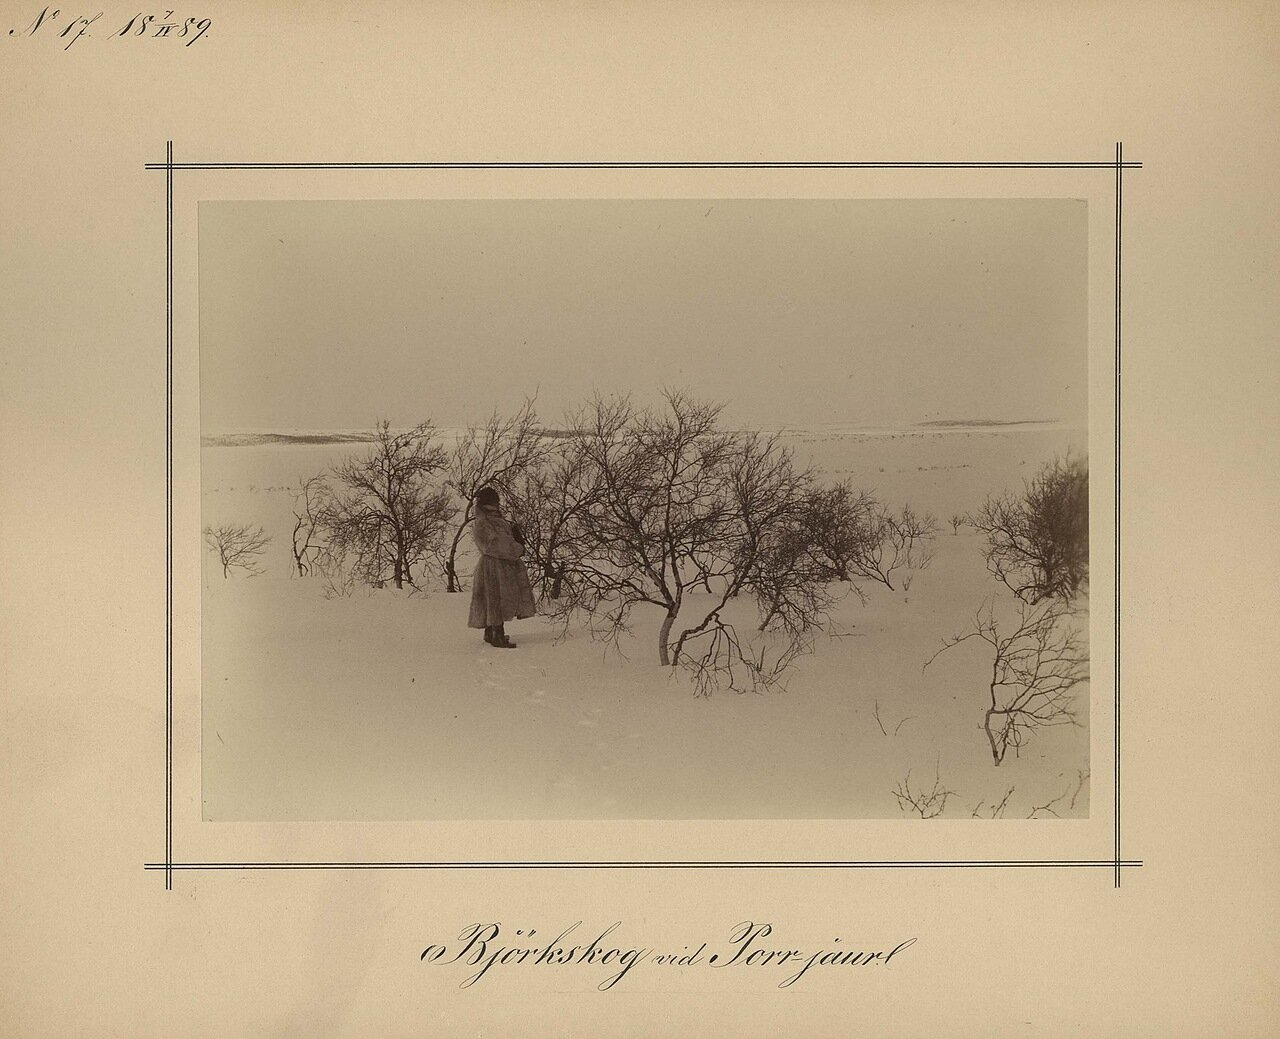 7.4.1889. Березовый лес